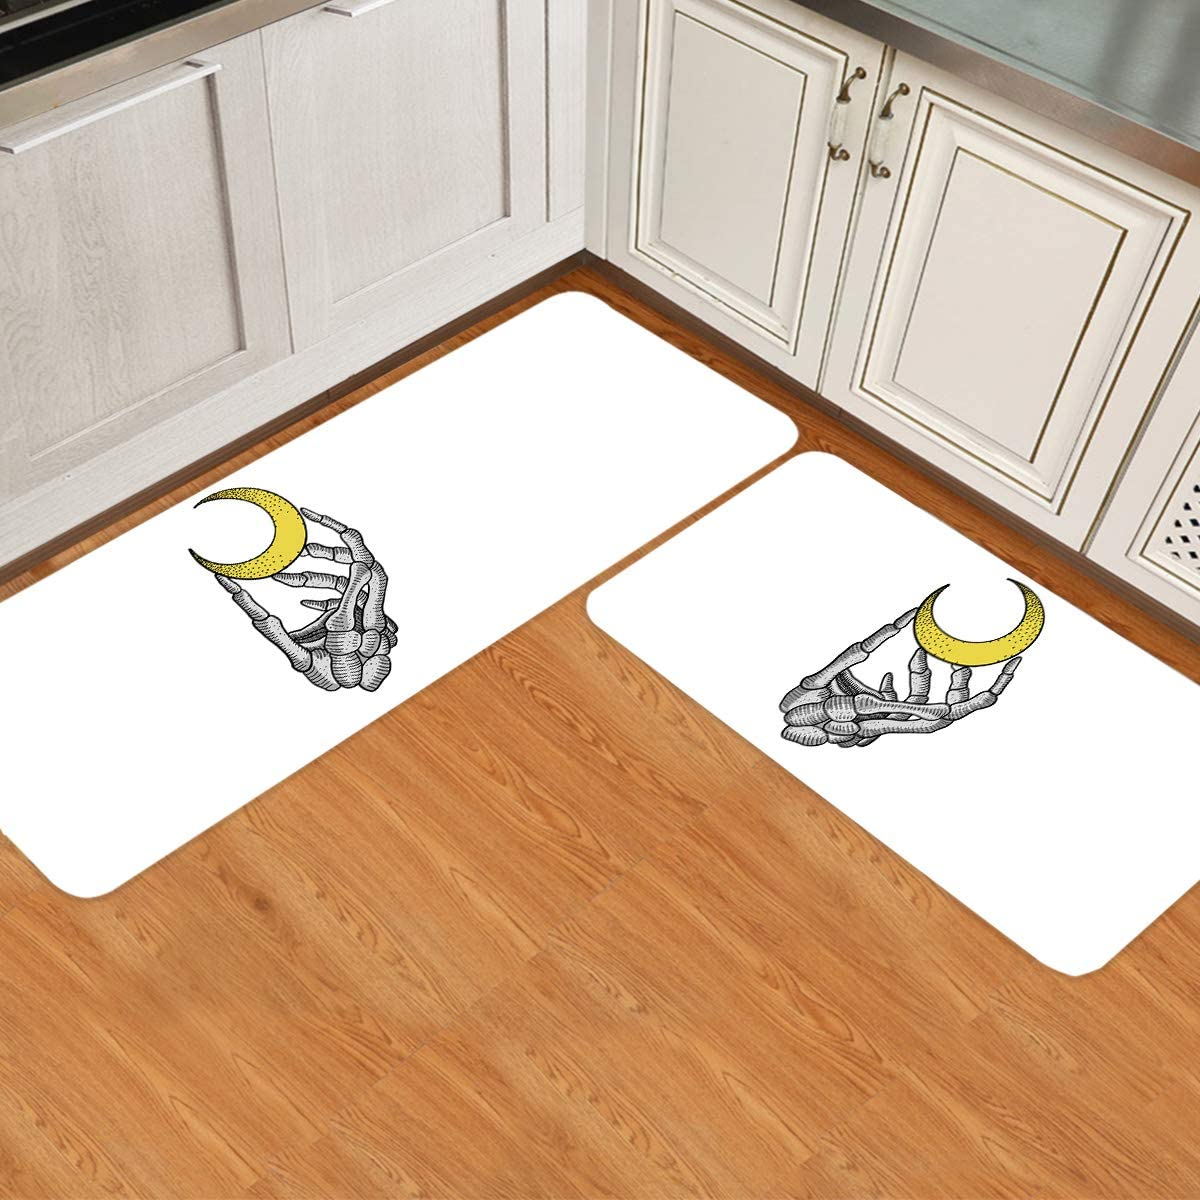 BABE MAPS Skeleton Hand Directly managed store Holding Moon Rug Set of Kitchen Floor 2 latest